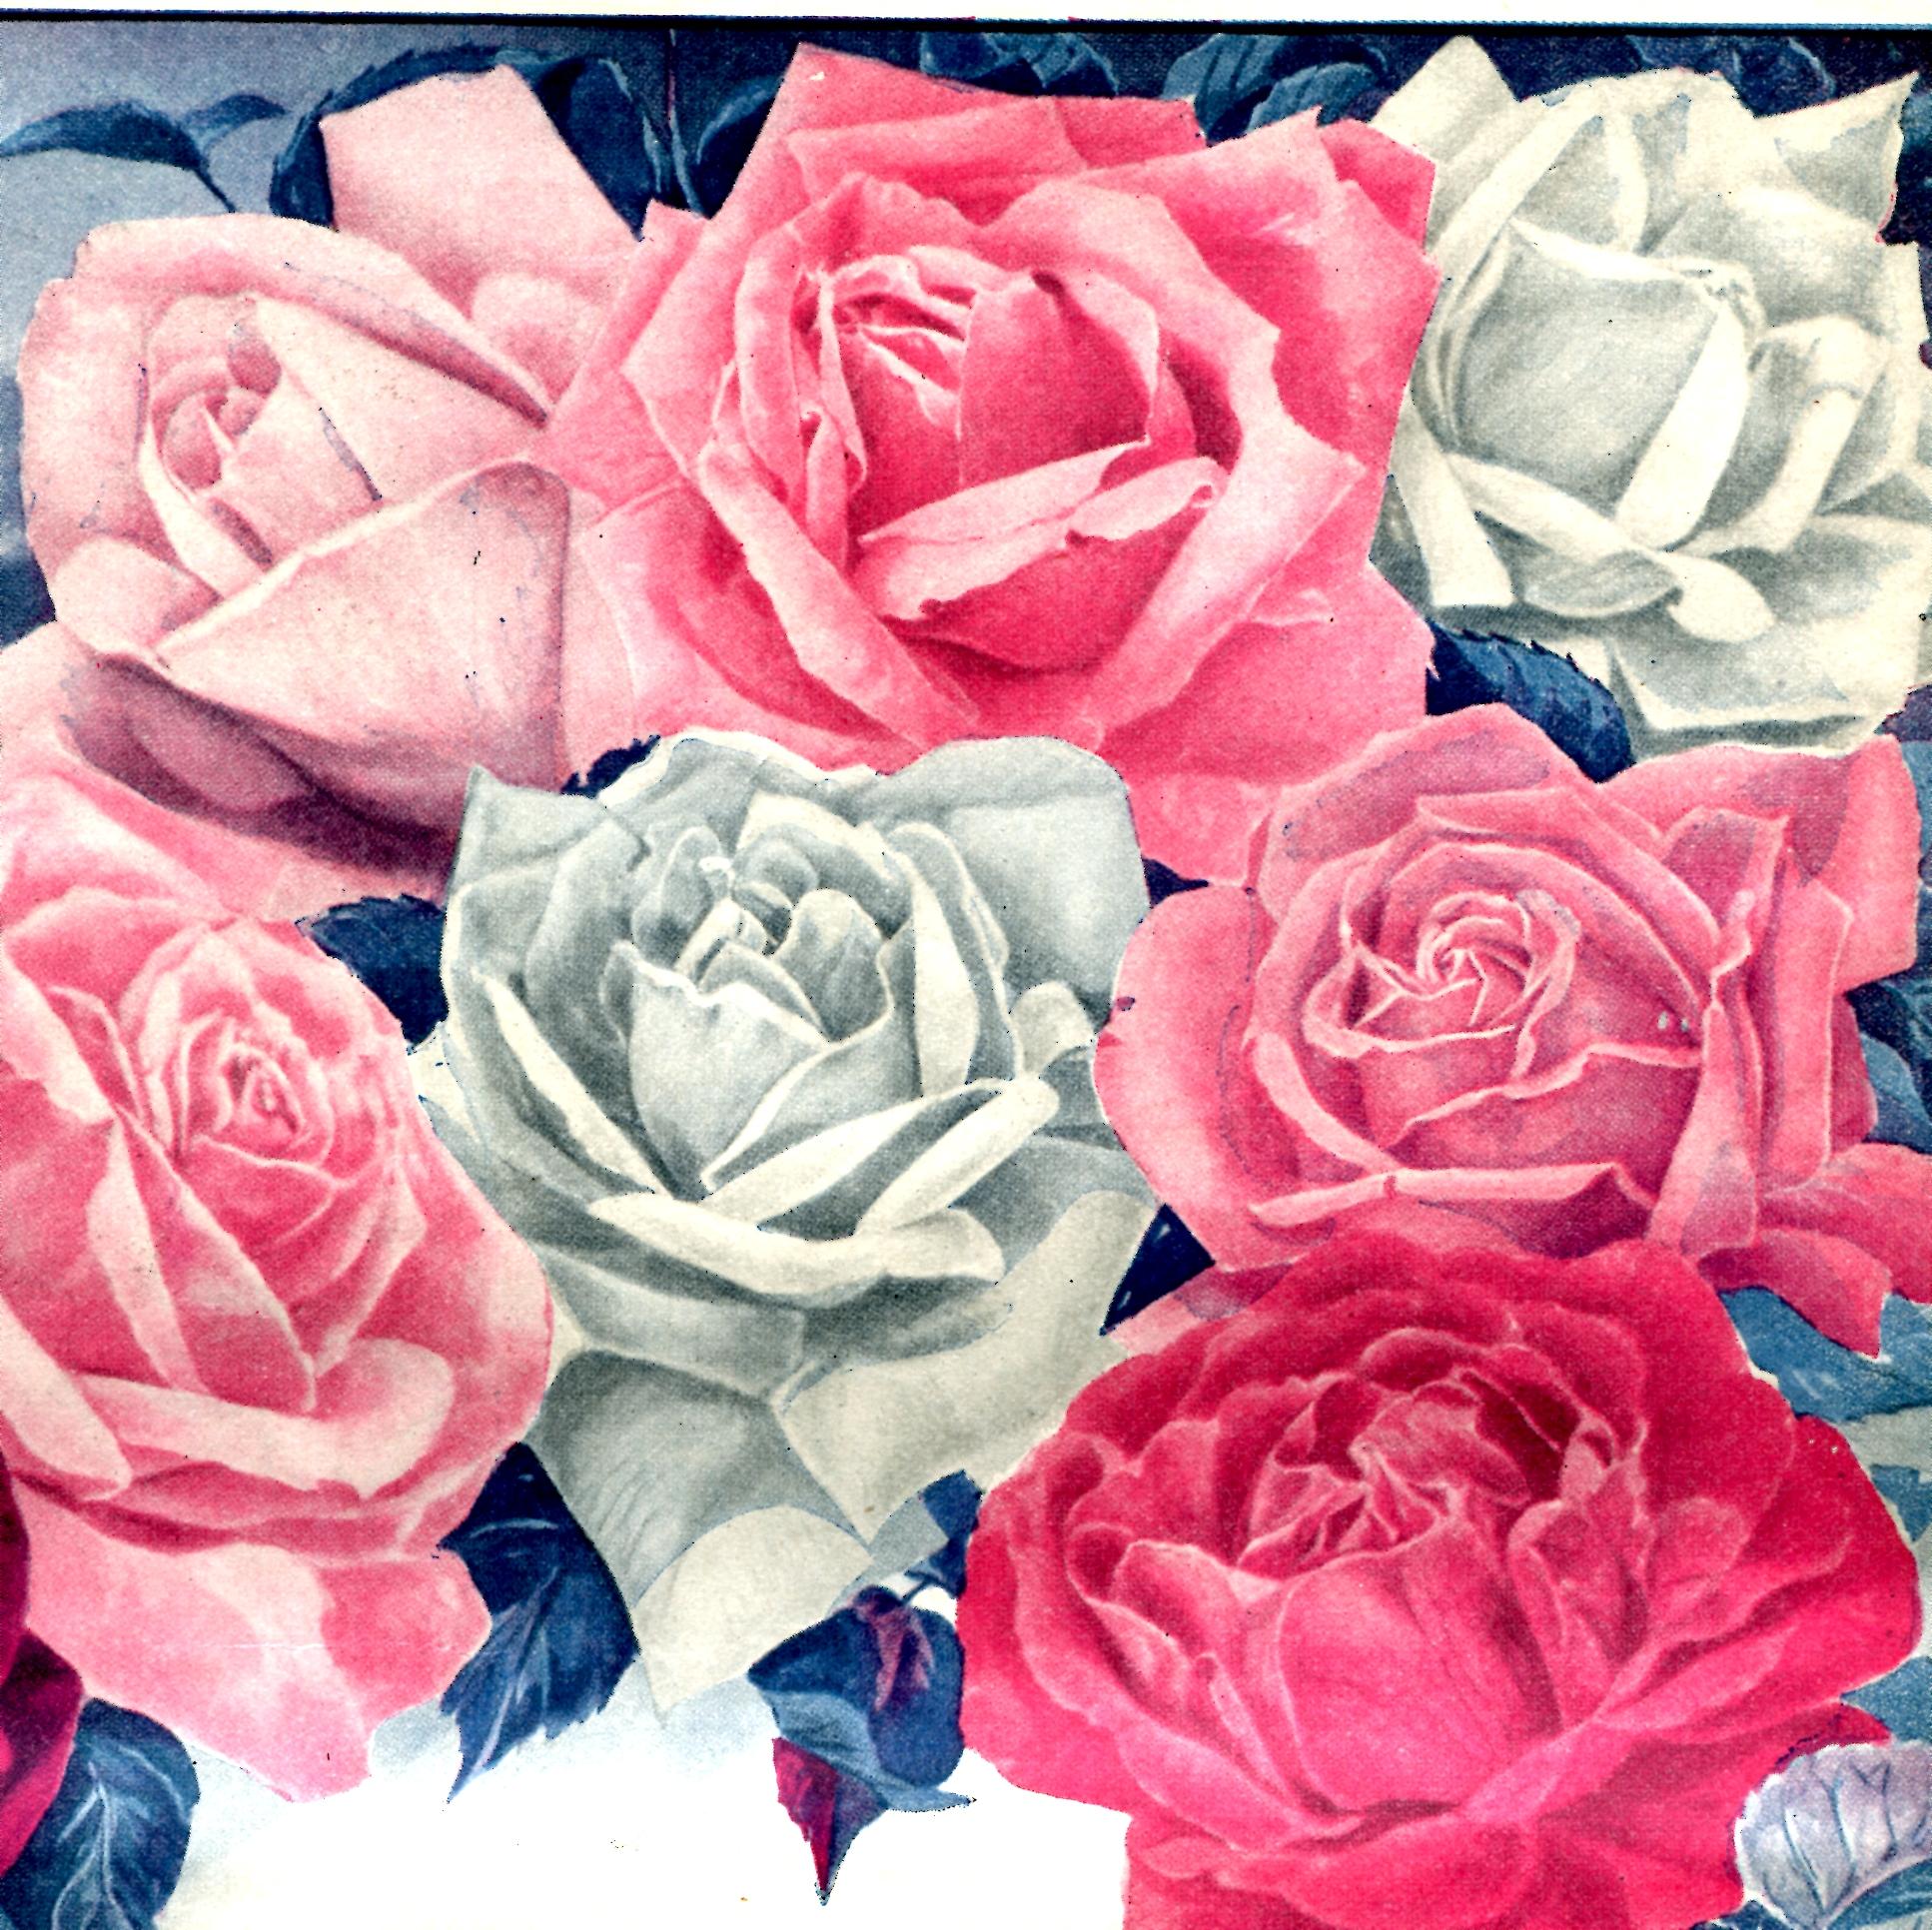 Vintage Valentine S Day Poem And Roses Vintage Crafts And More